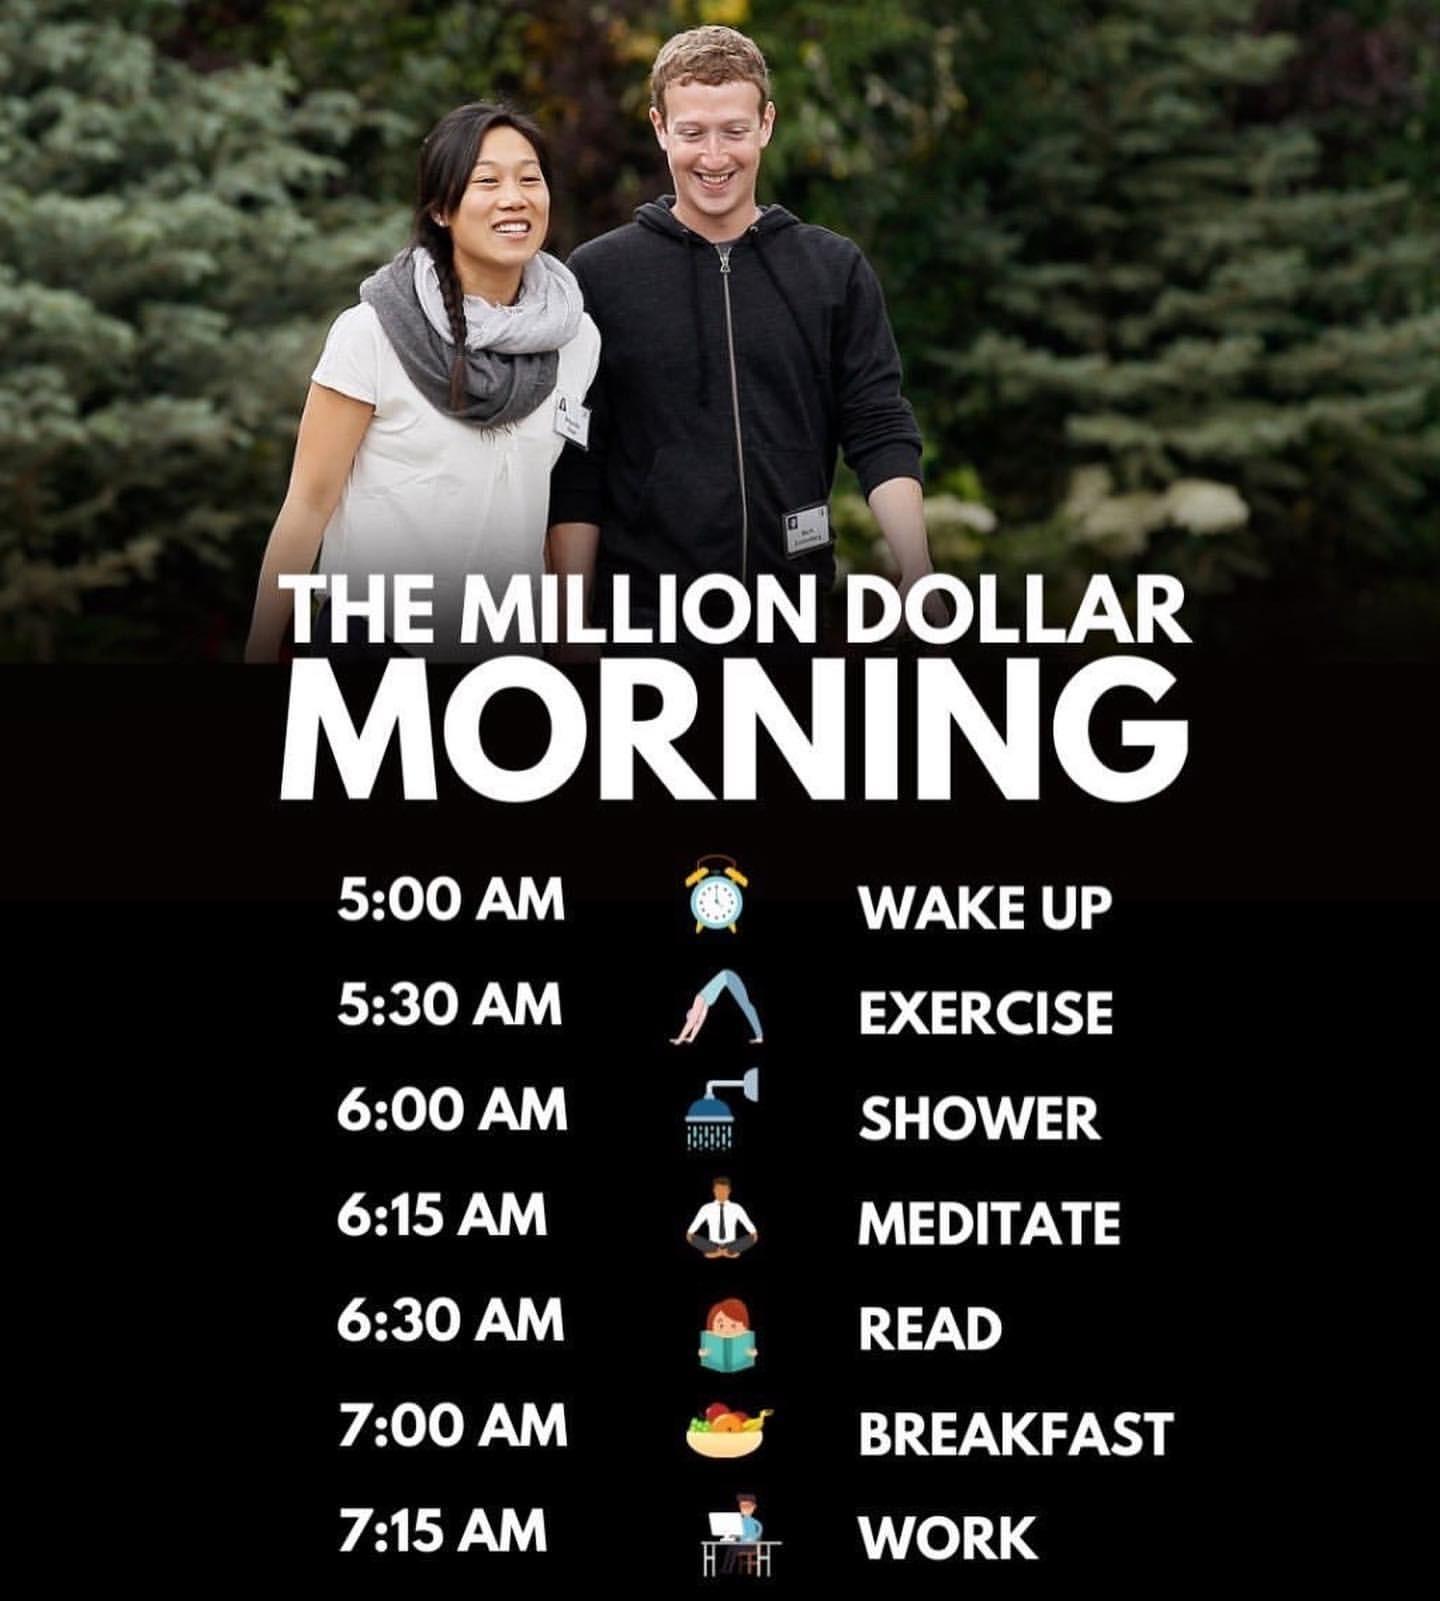 [image] Mornings